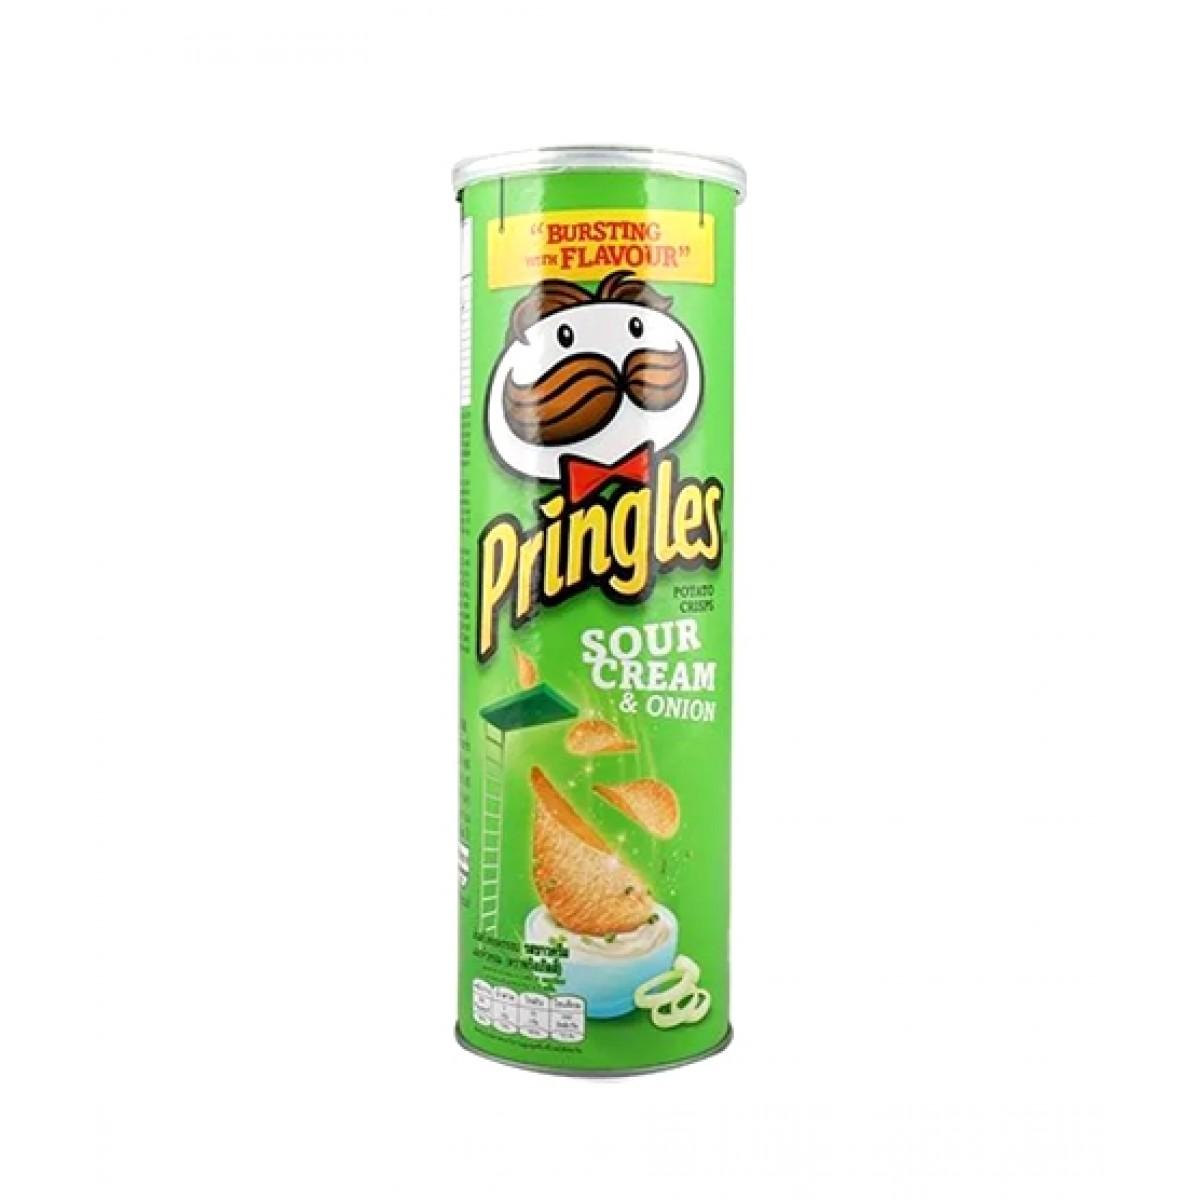 Pringles Sour Cream & Onion Potato Chips 110g